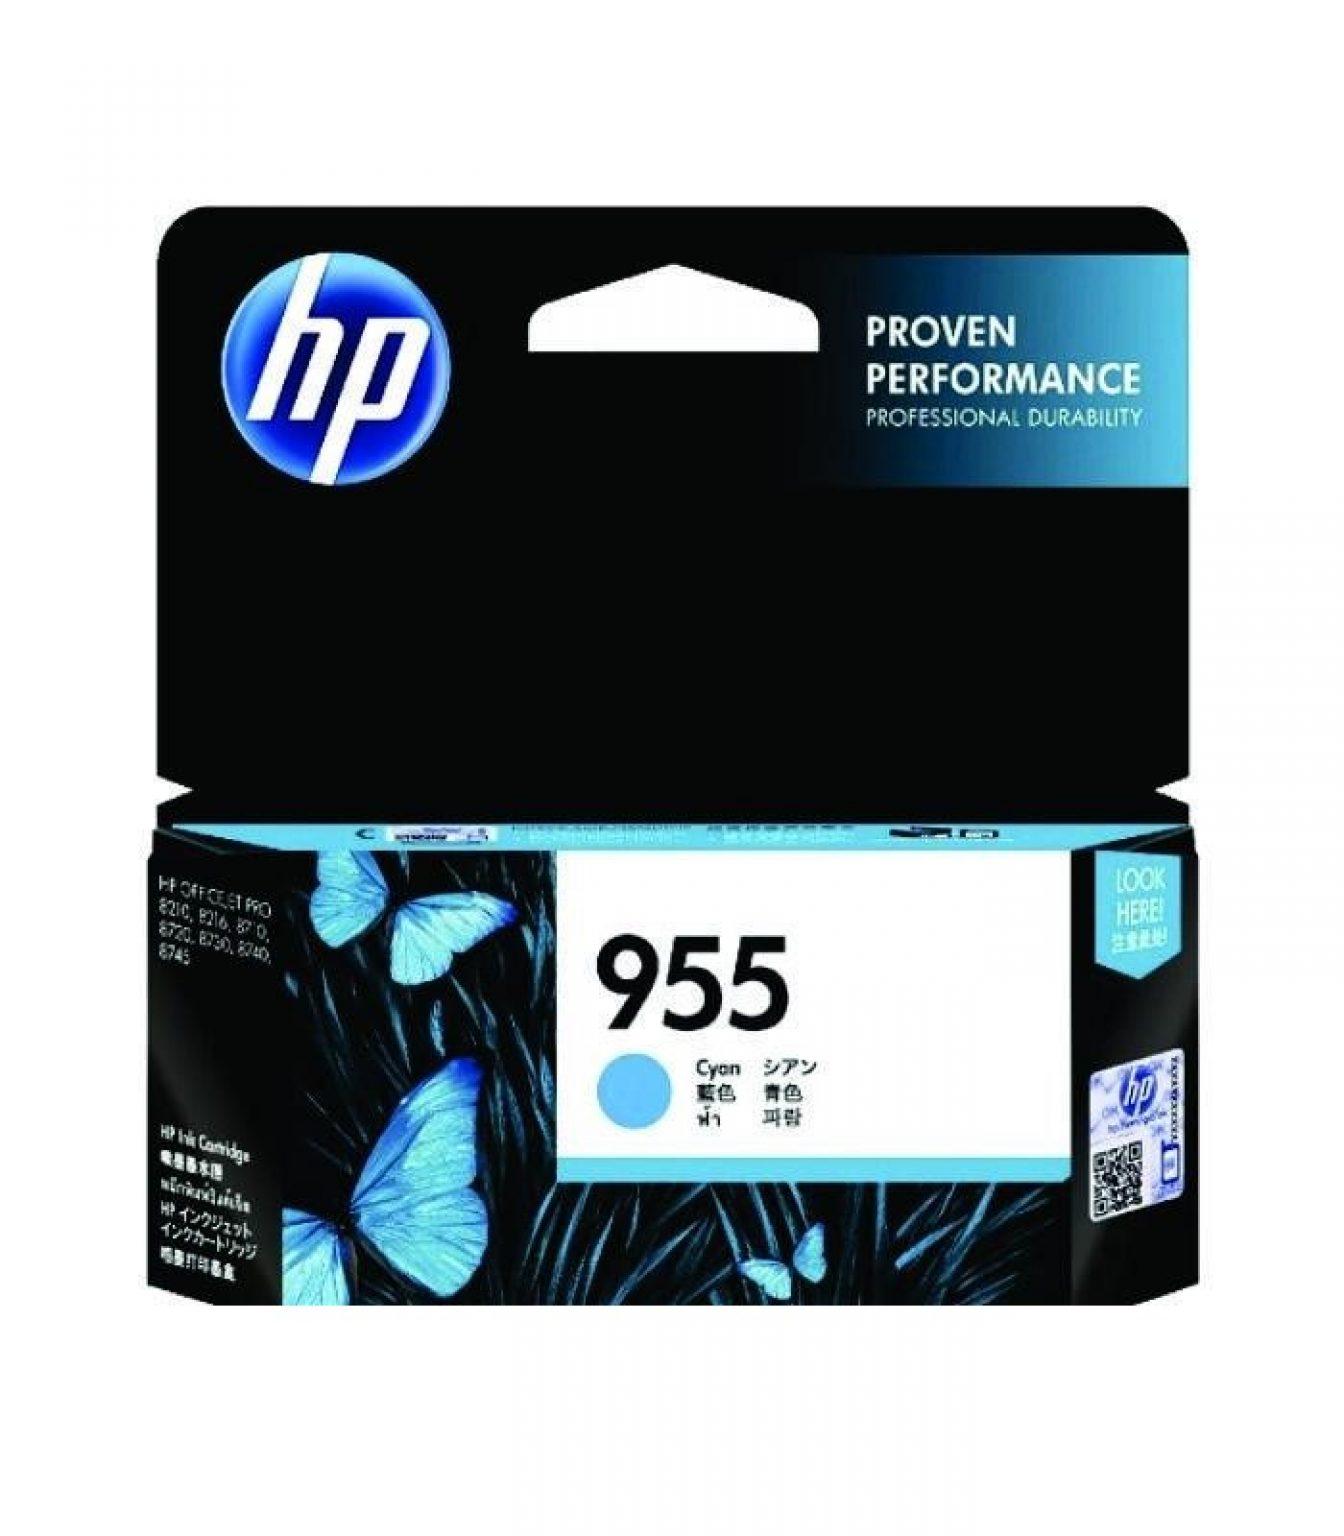 HP - 955 Cyan Original Ink Cartridge [L0S51AA]